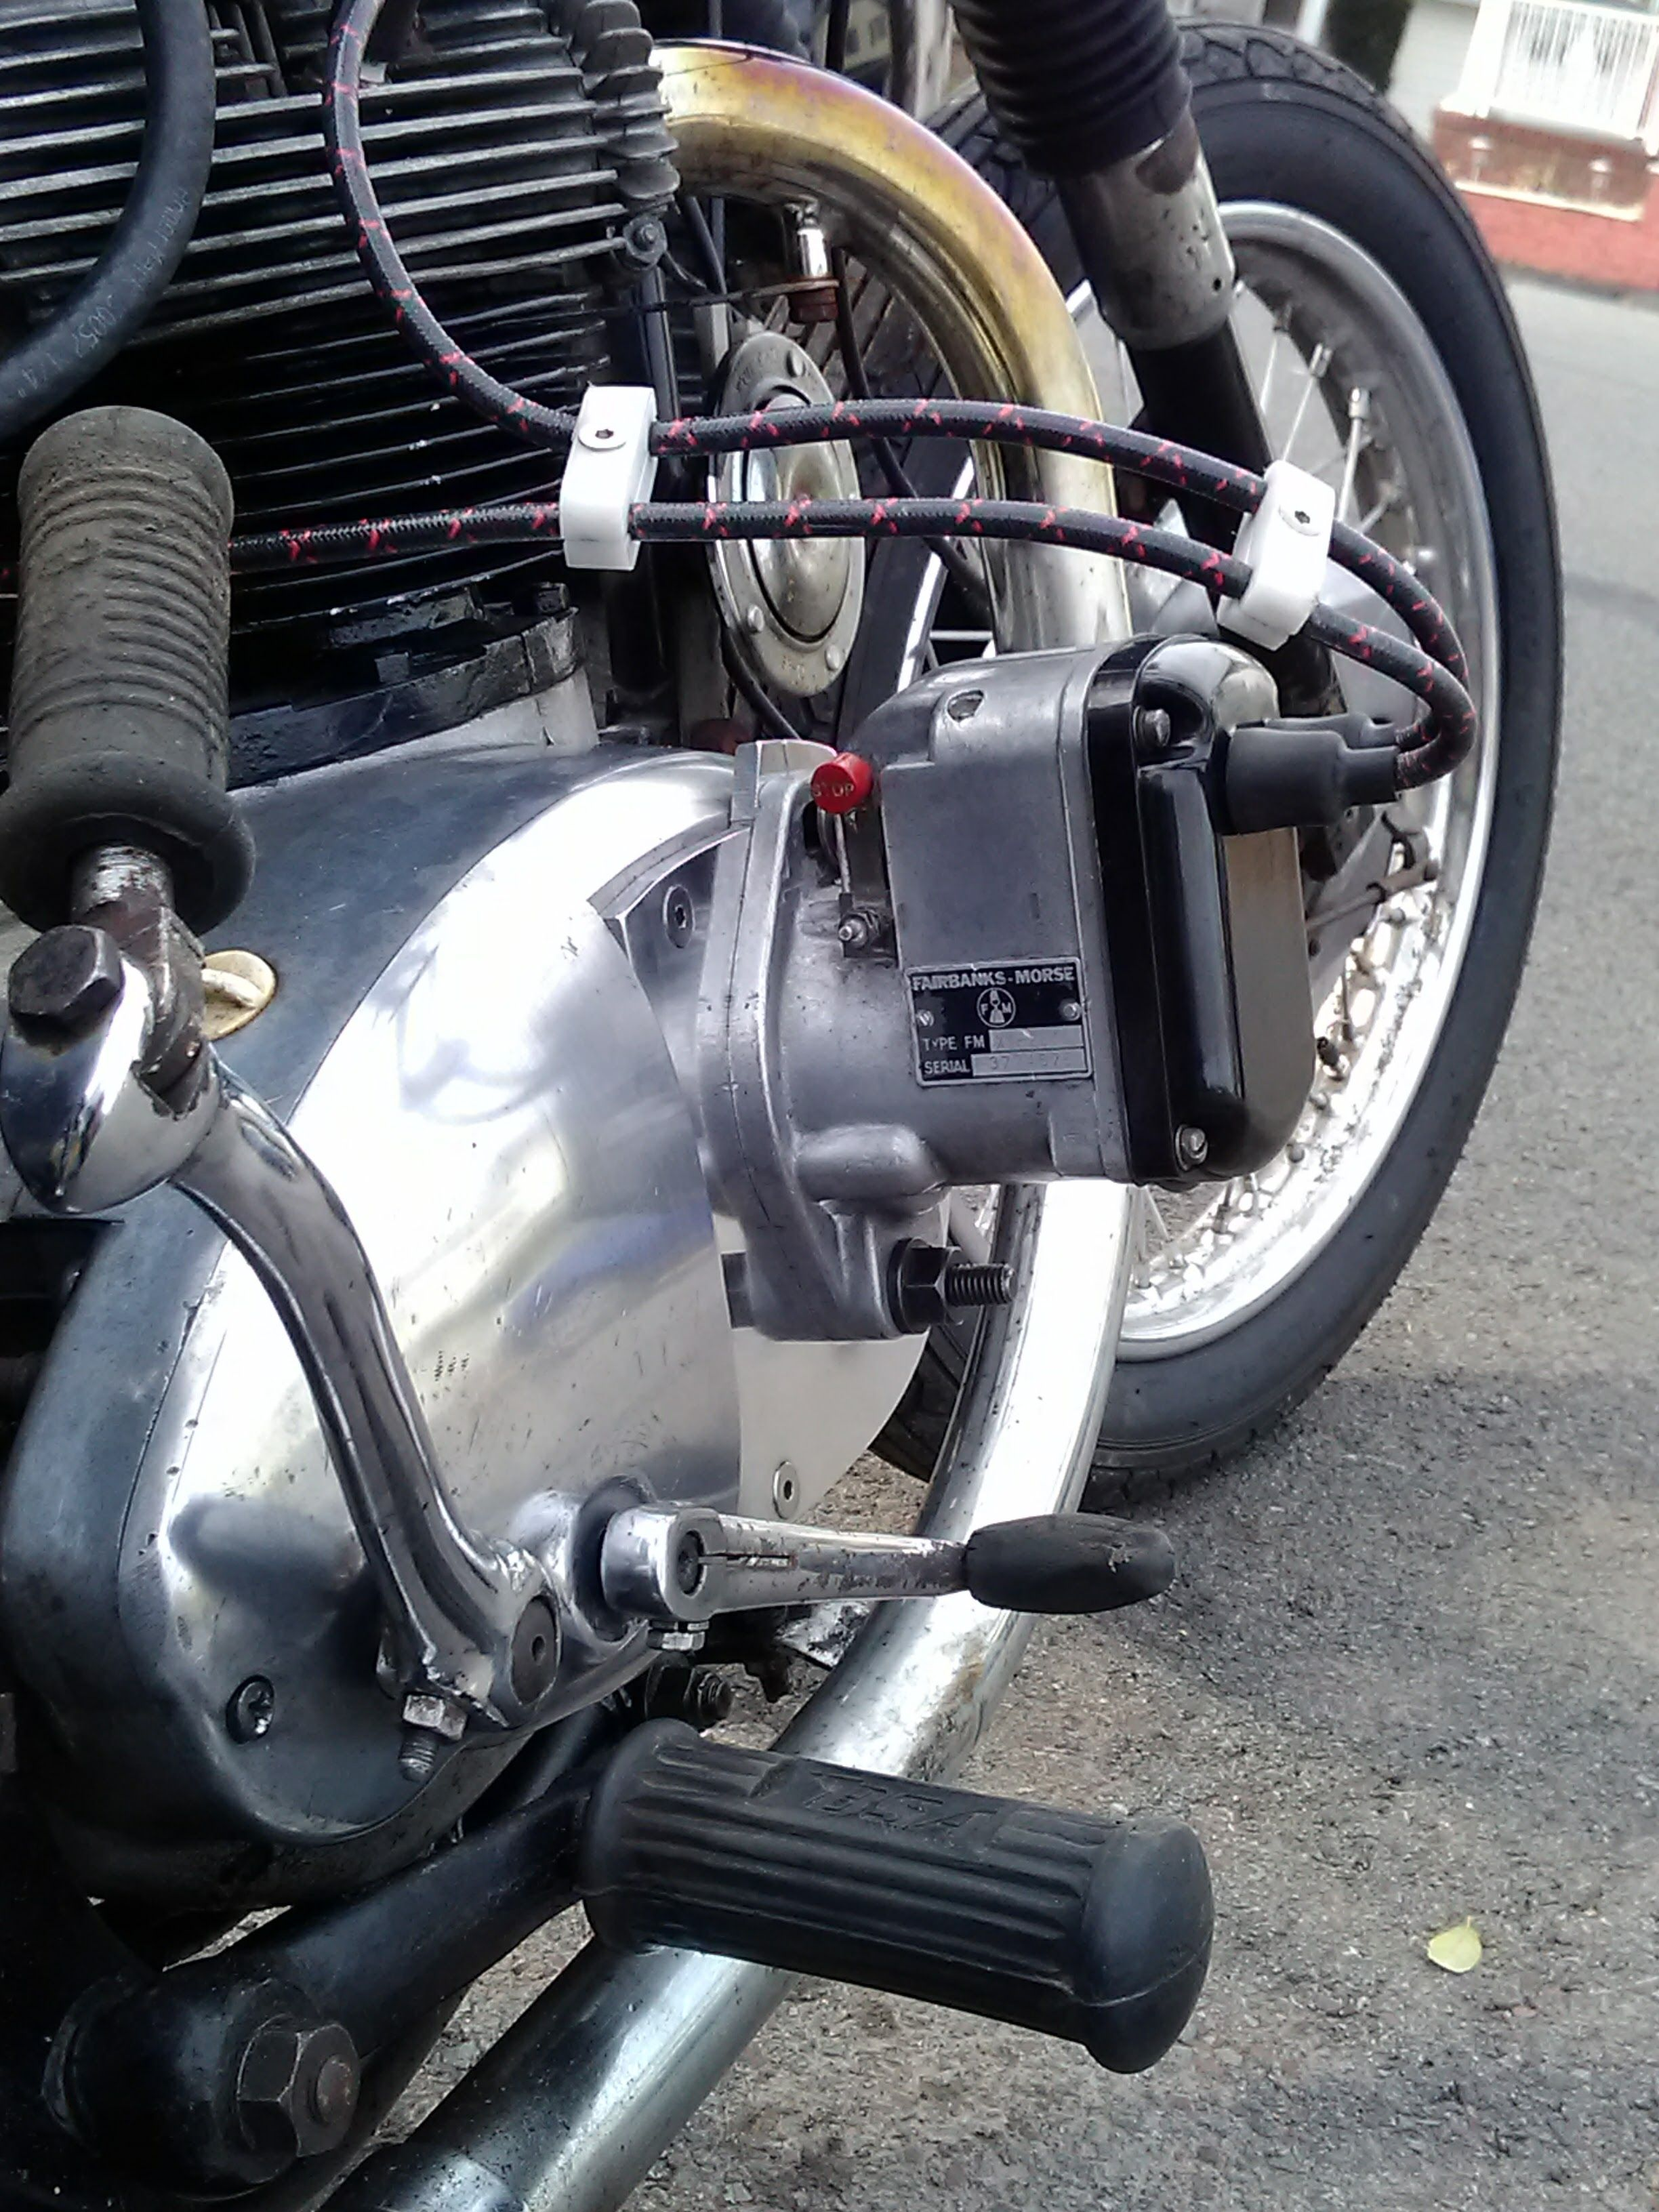 hight resolution of 1969 bsa motorcycle magneto mod